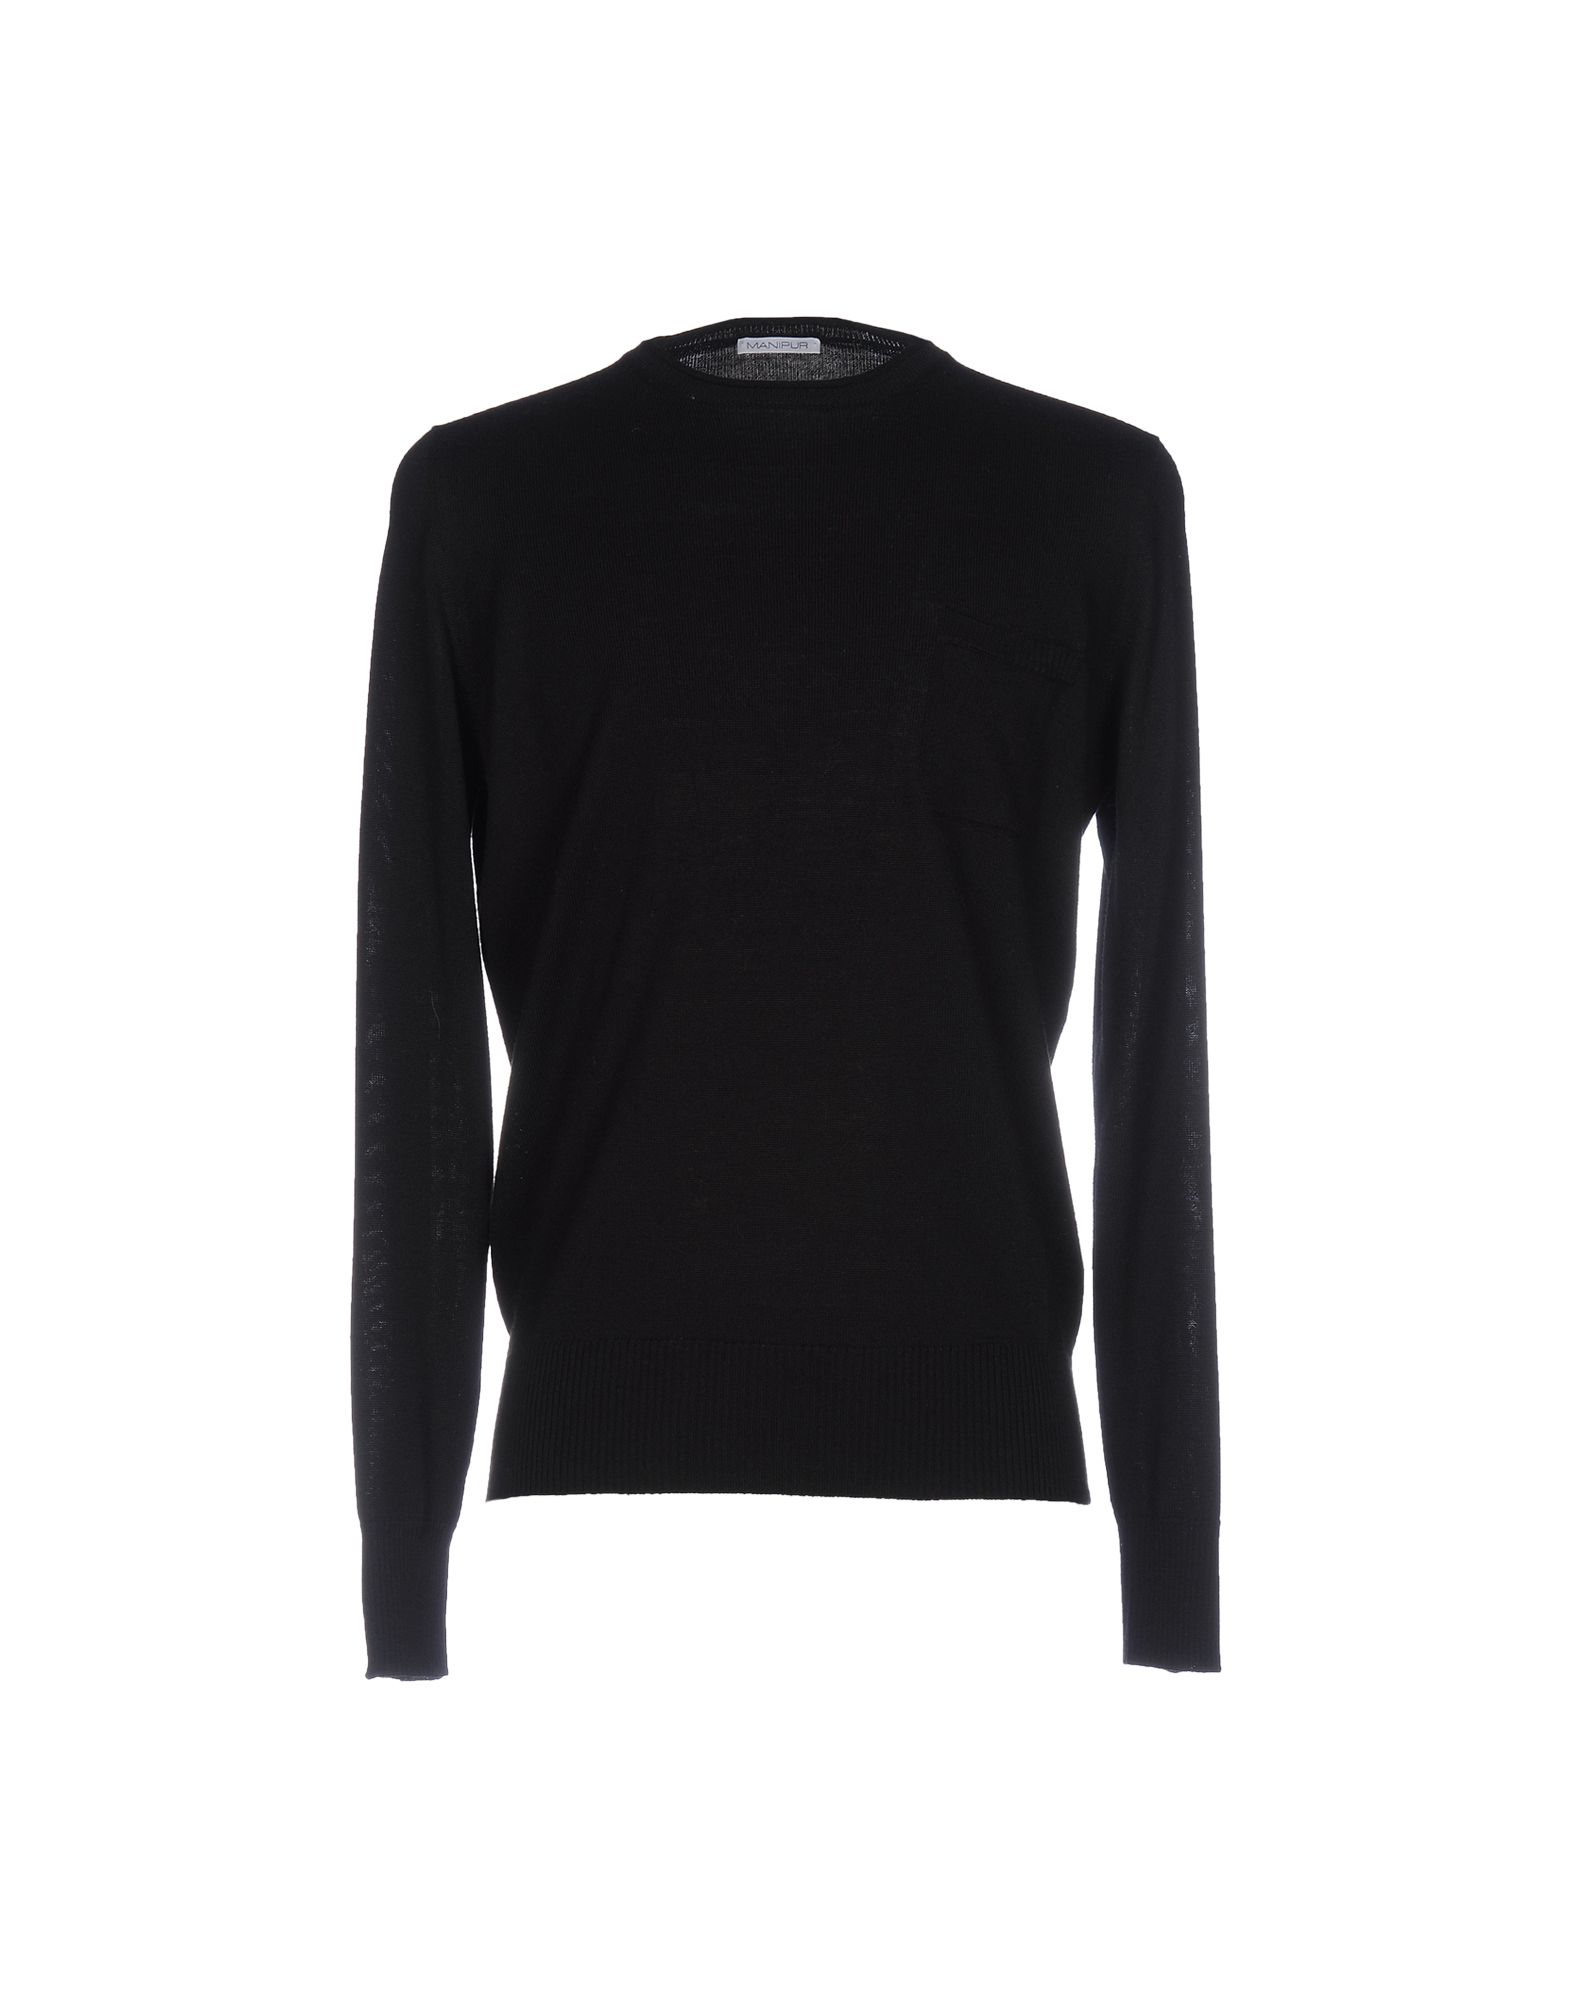 MANIPUR CASHMERE Свитер autumn cashmere свитер